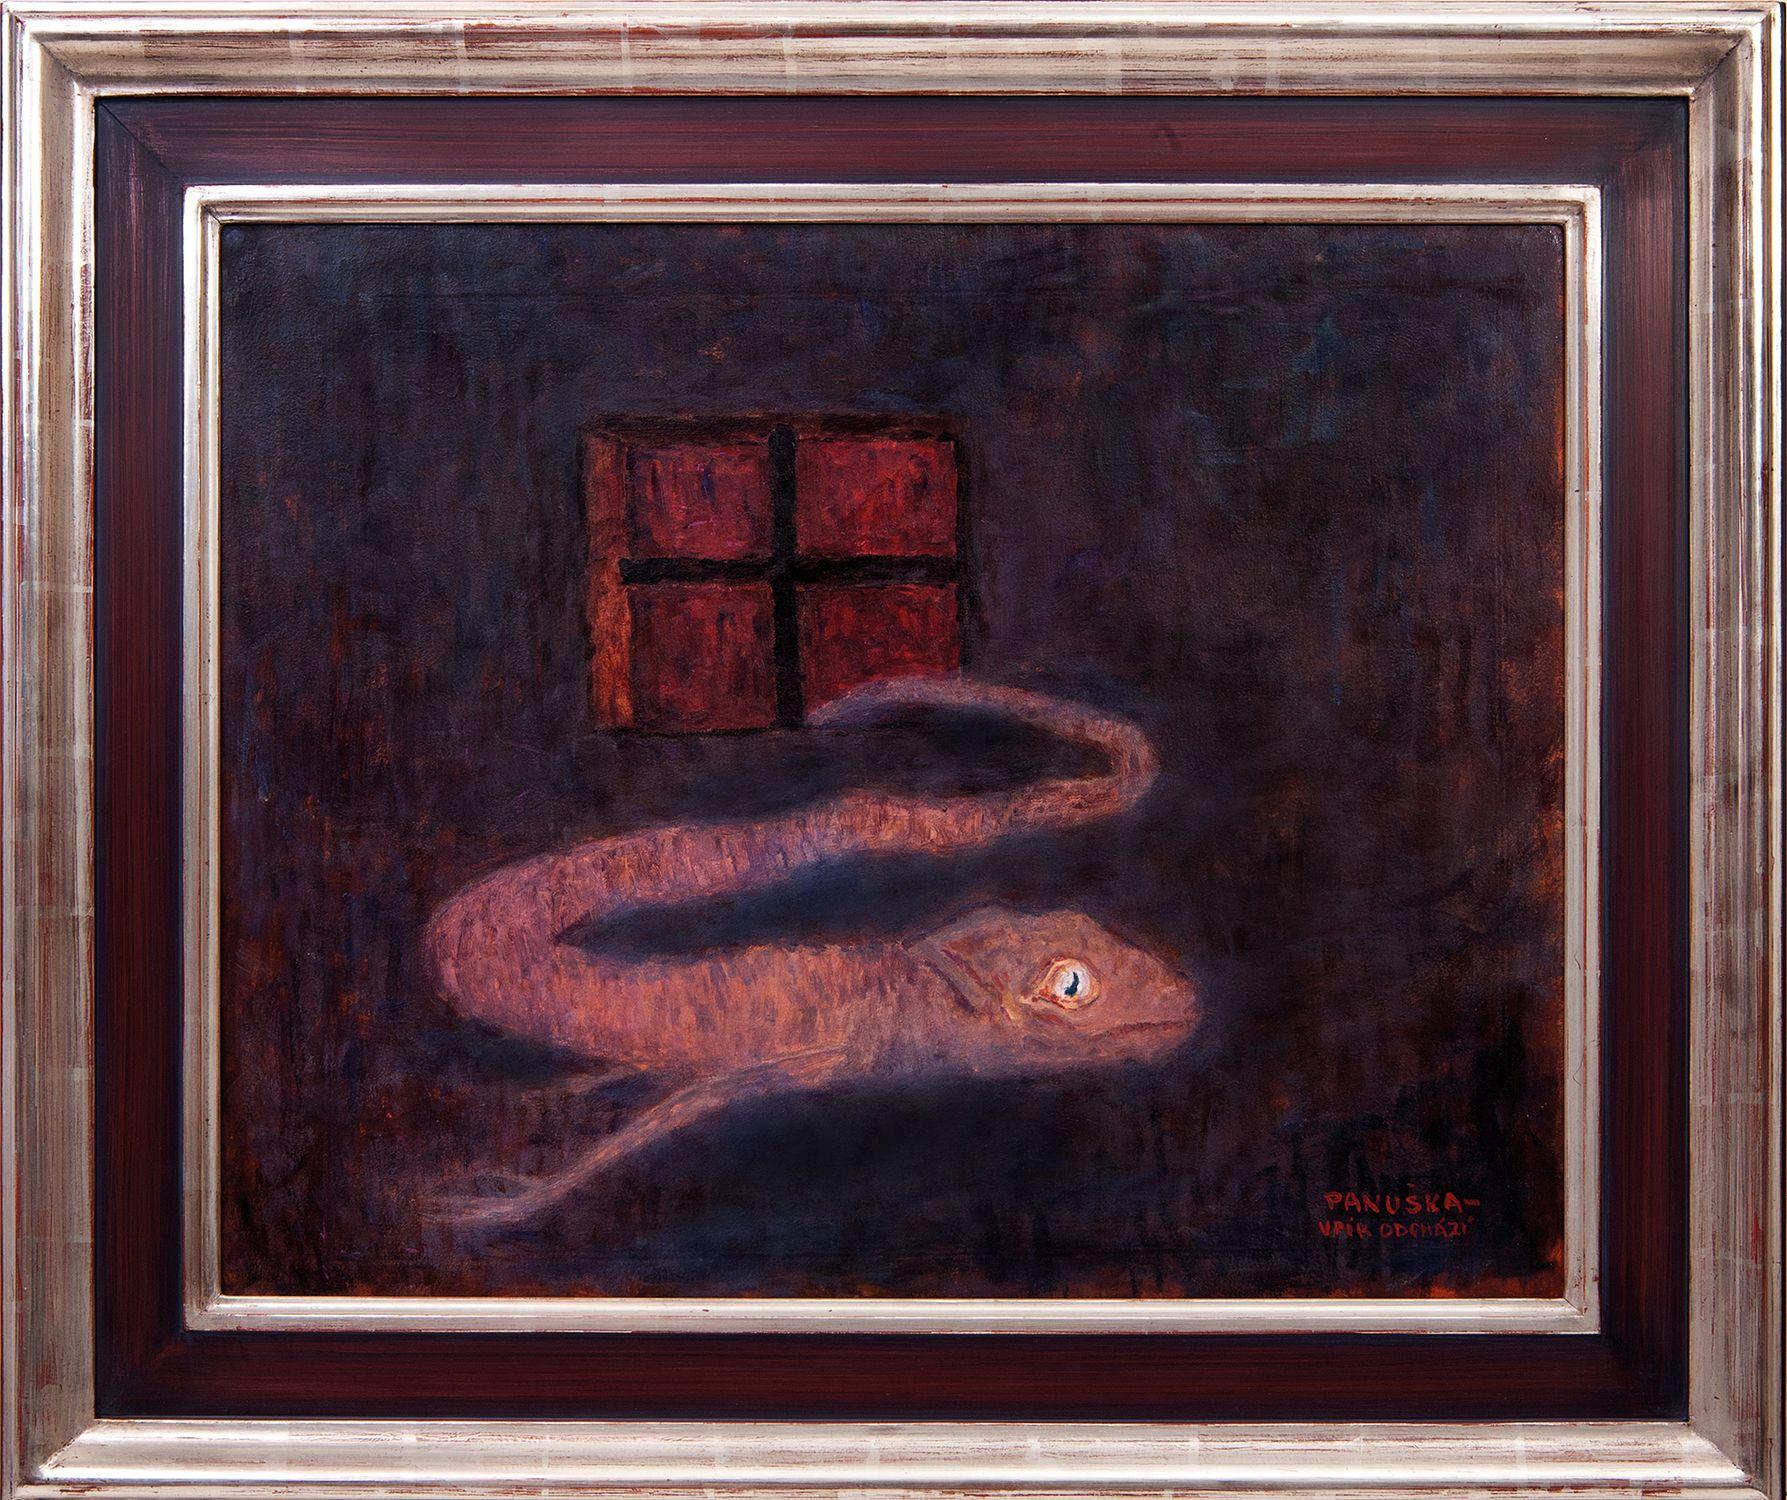 Jaroslav Panuška, Upir, Vampiro (1900 circa; olio su cartone, 50 x 63 cm; Collezione privata)